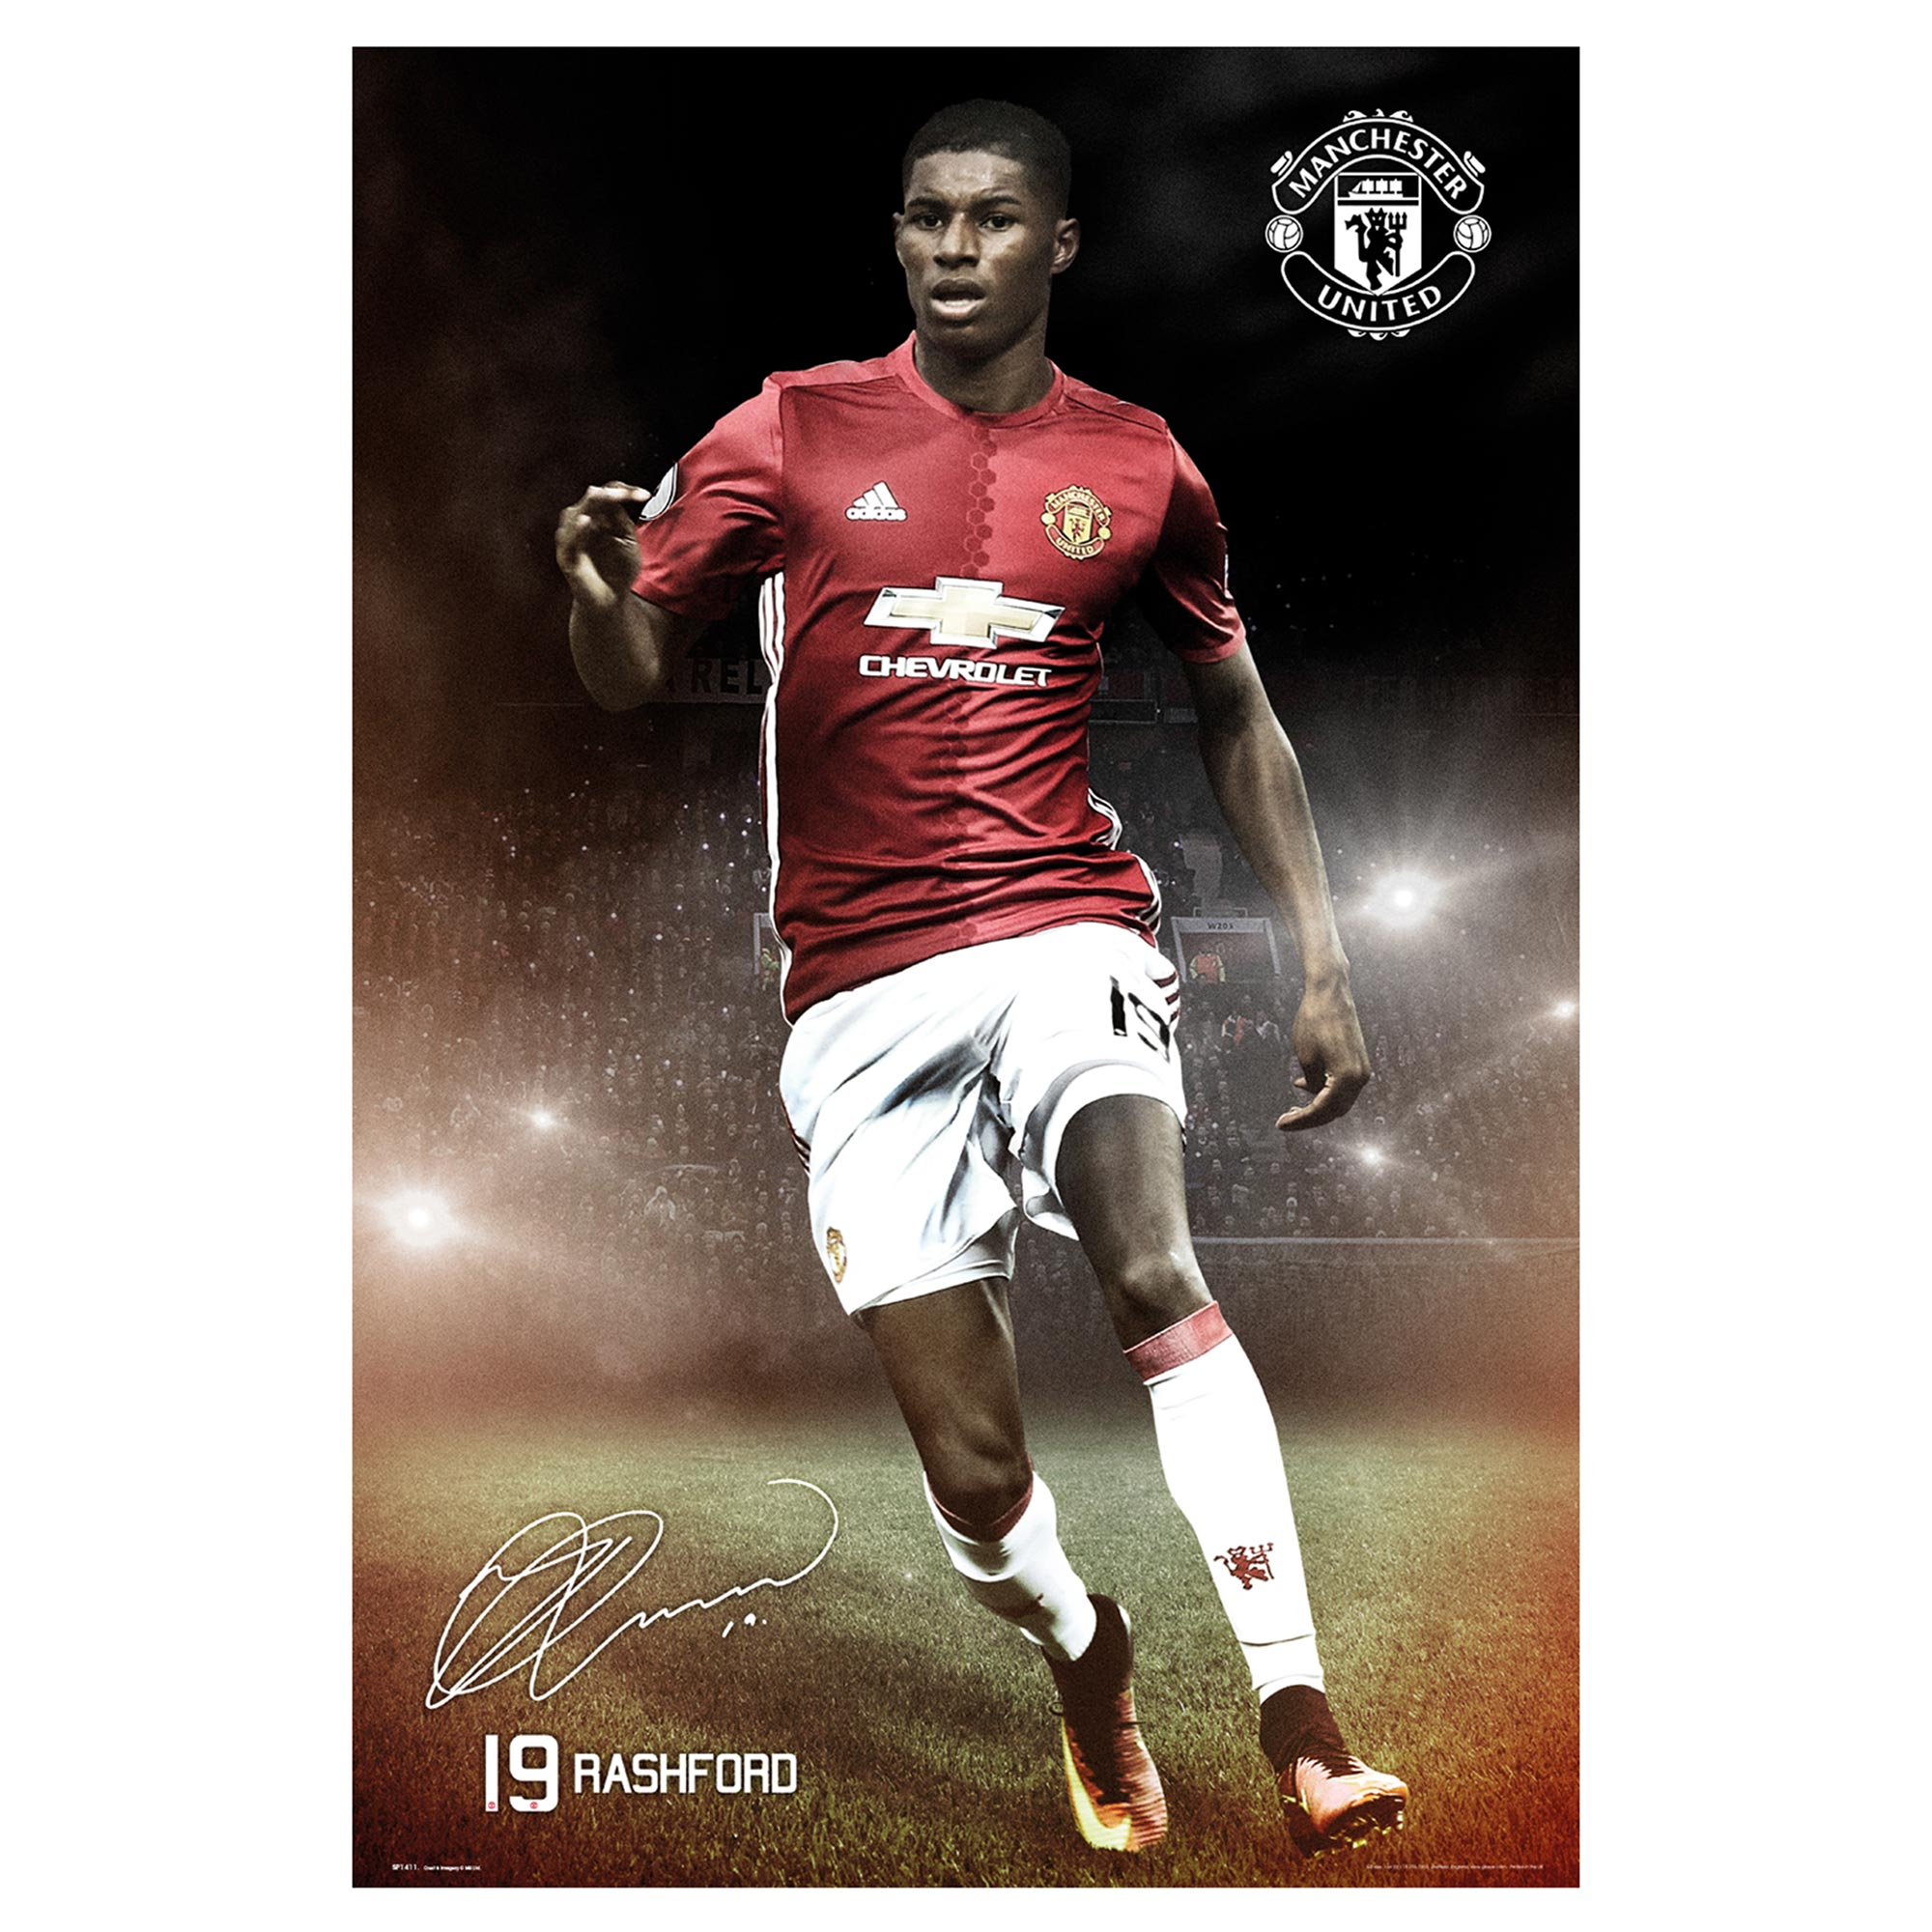 Manchester United 16-17 Rashford Poster - 61 x 92cm